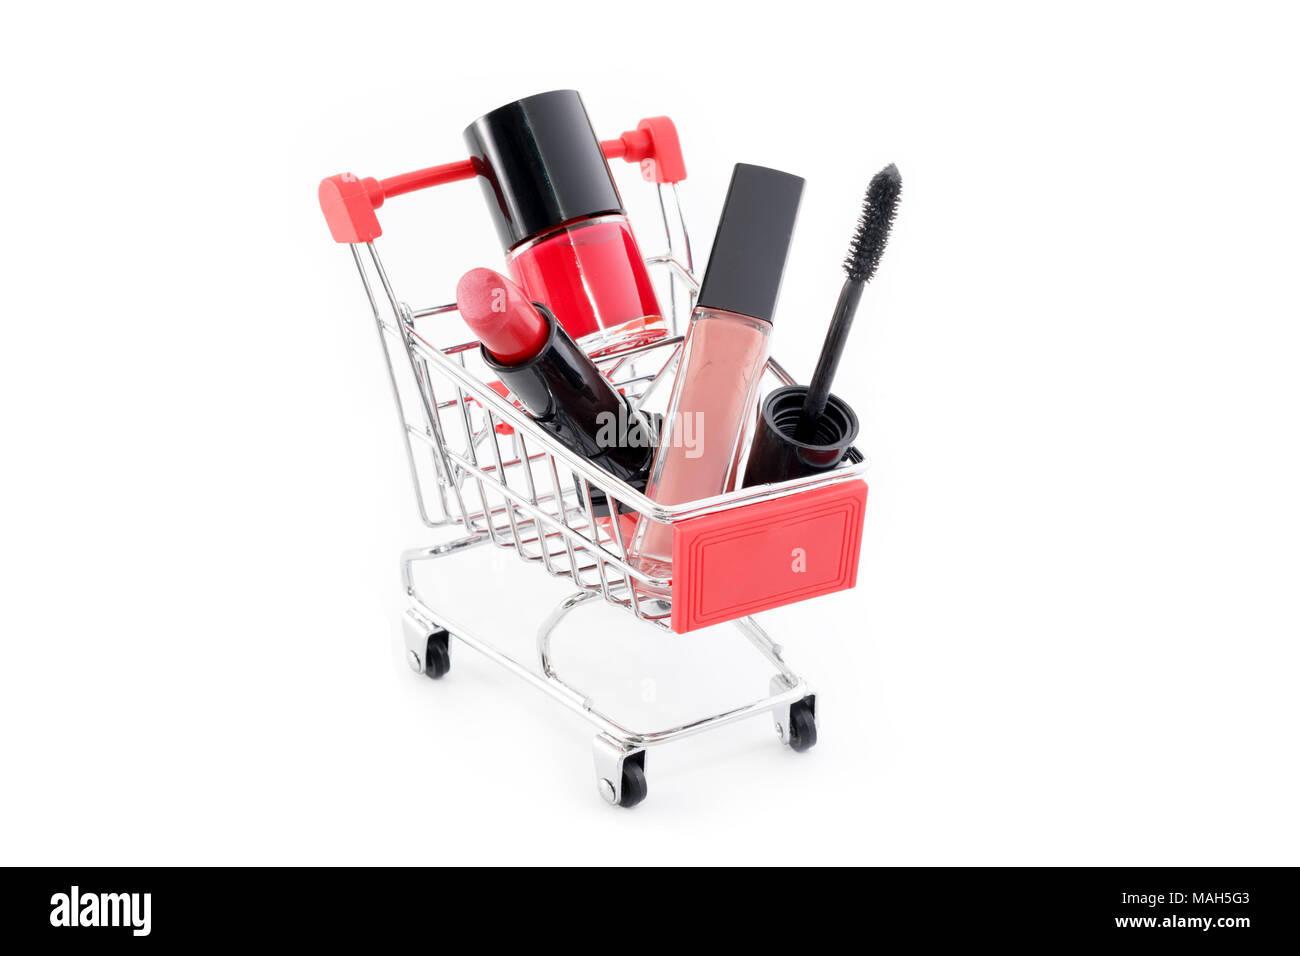 Beauty Lip Shop Stock Photos & Beauty Lip Shop Stock ...